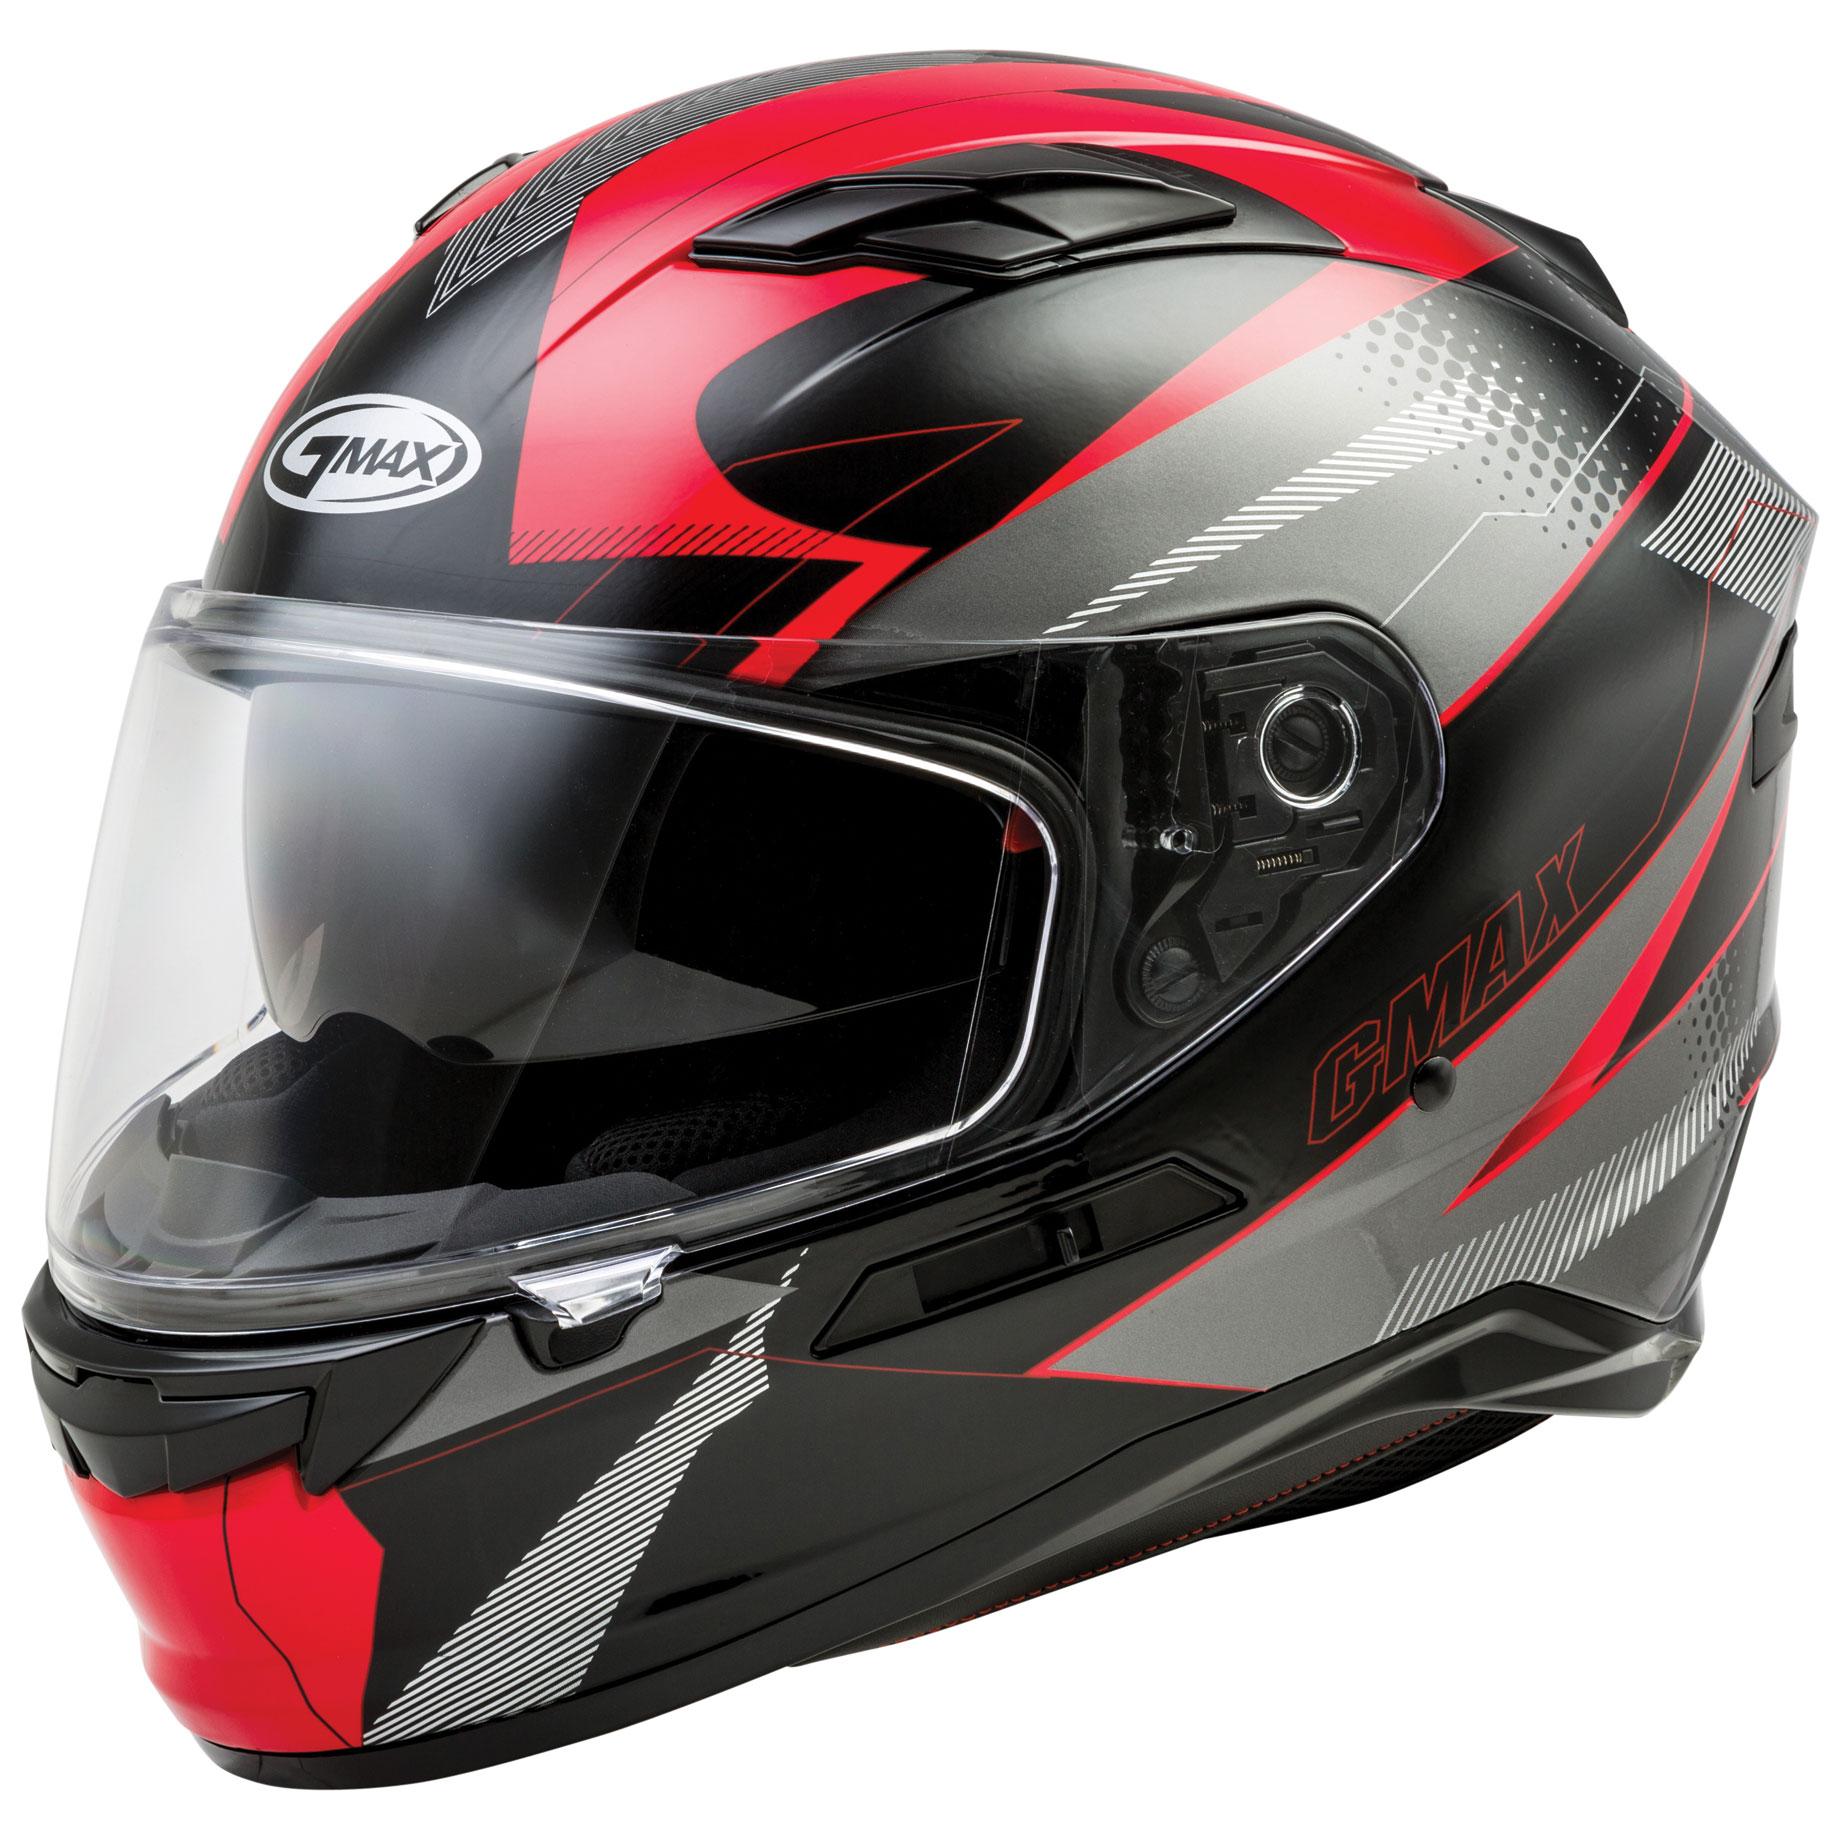 GMAX FF98 Apex Black/Red Full Face Helmet